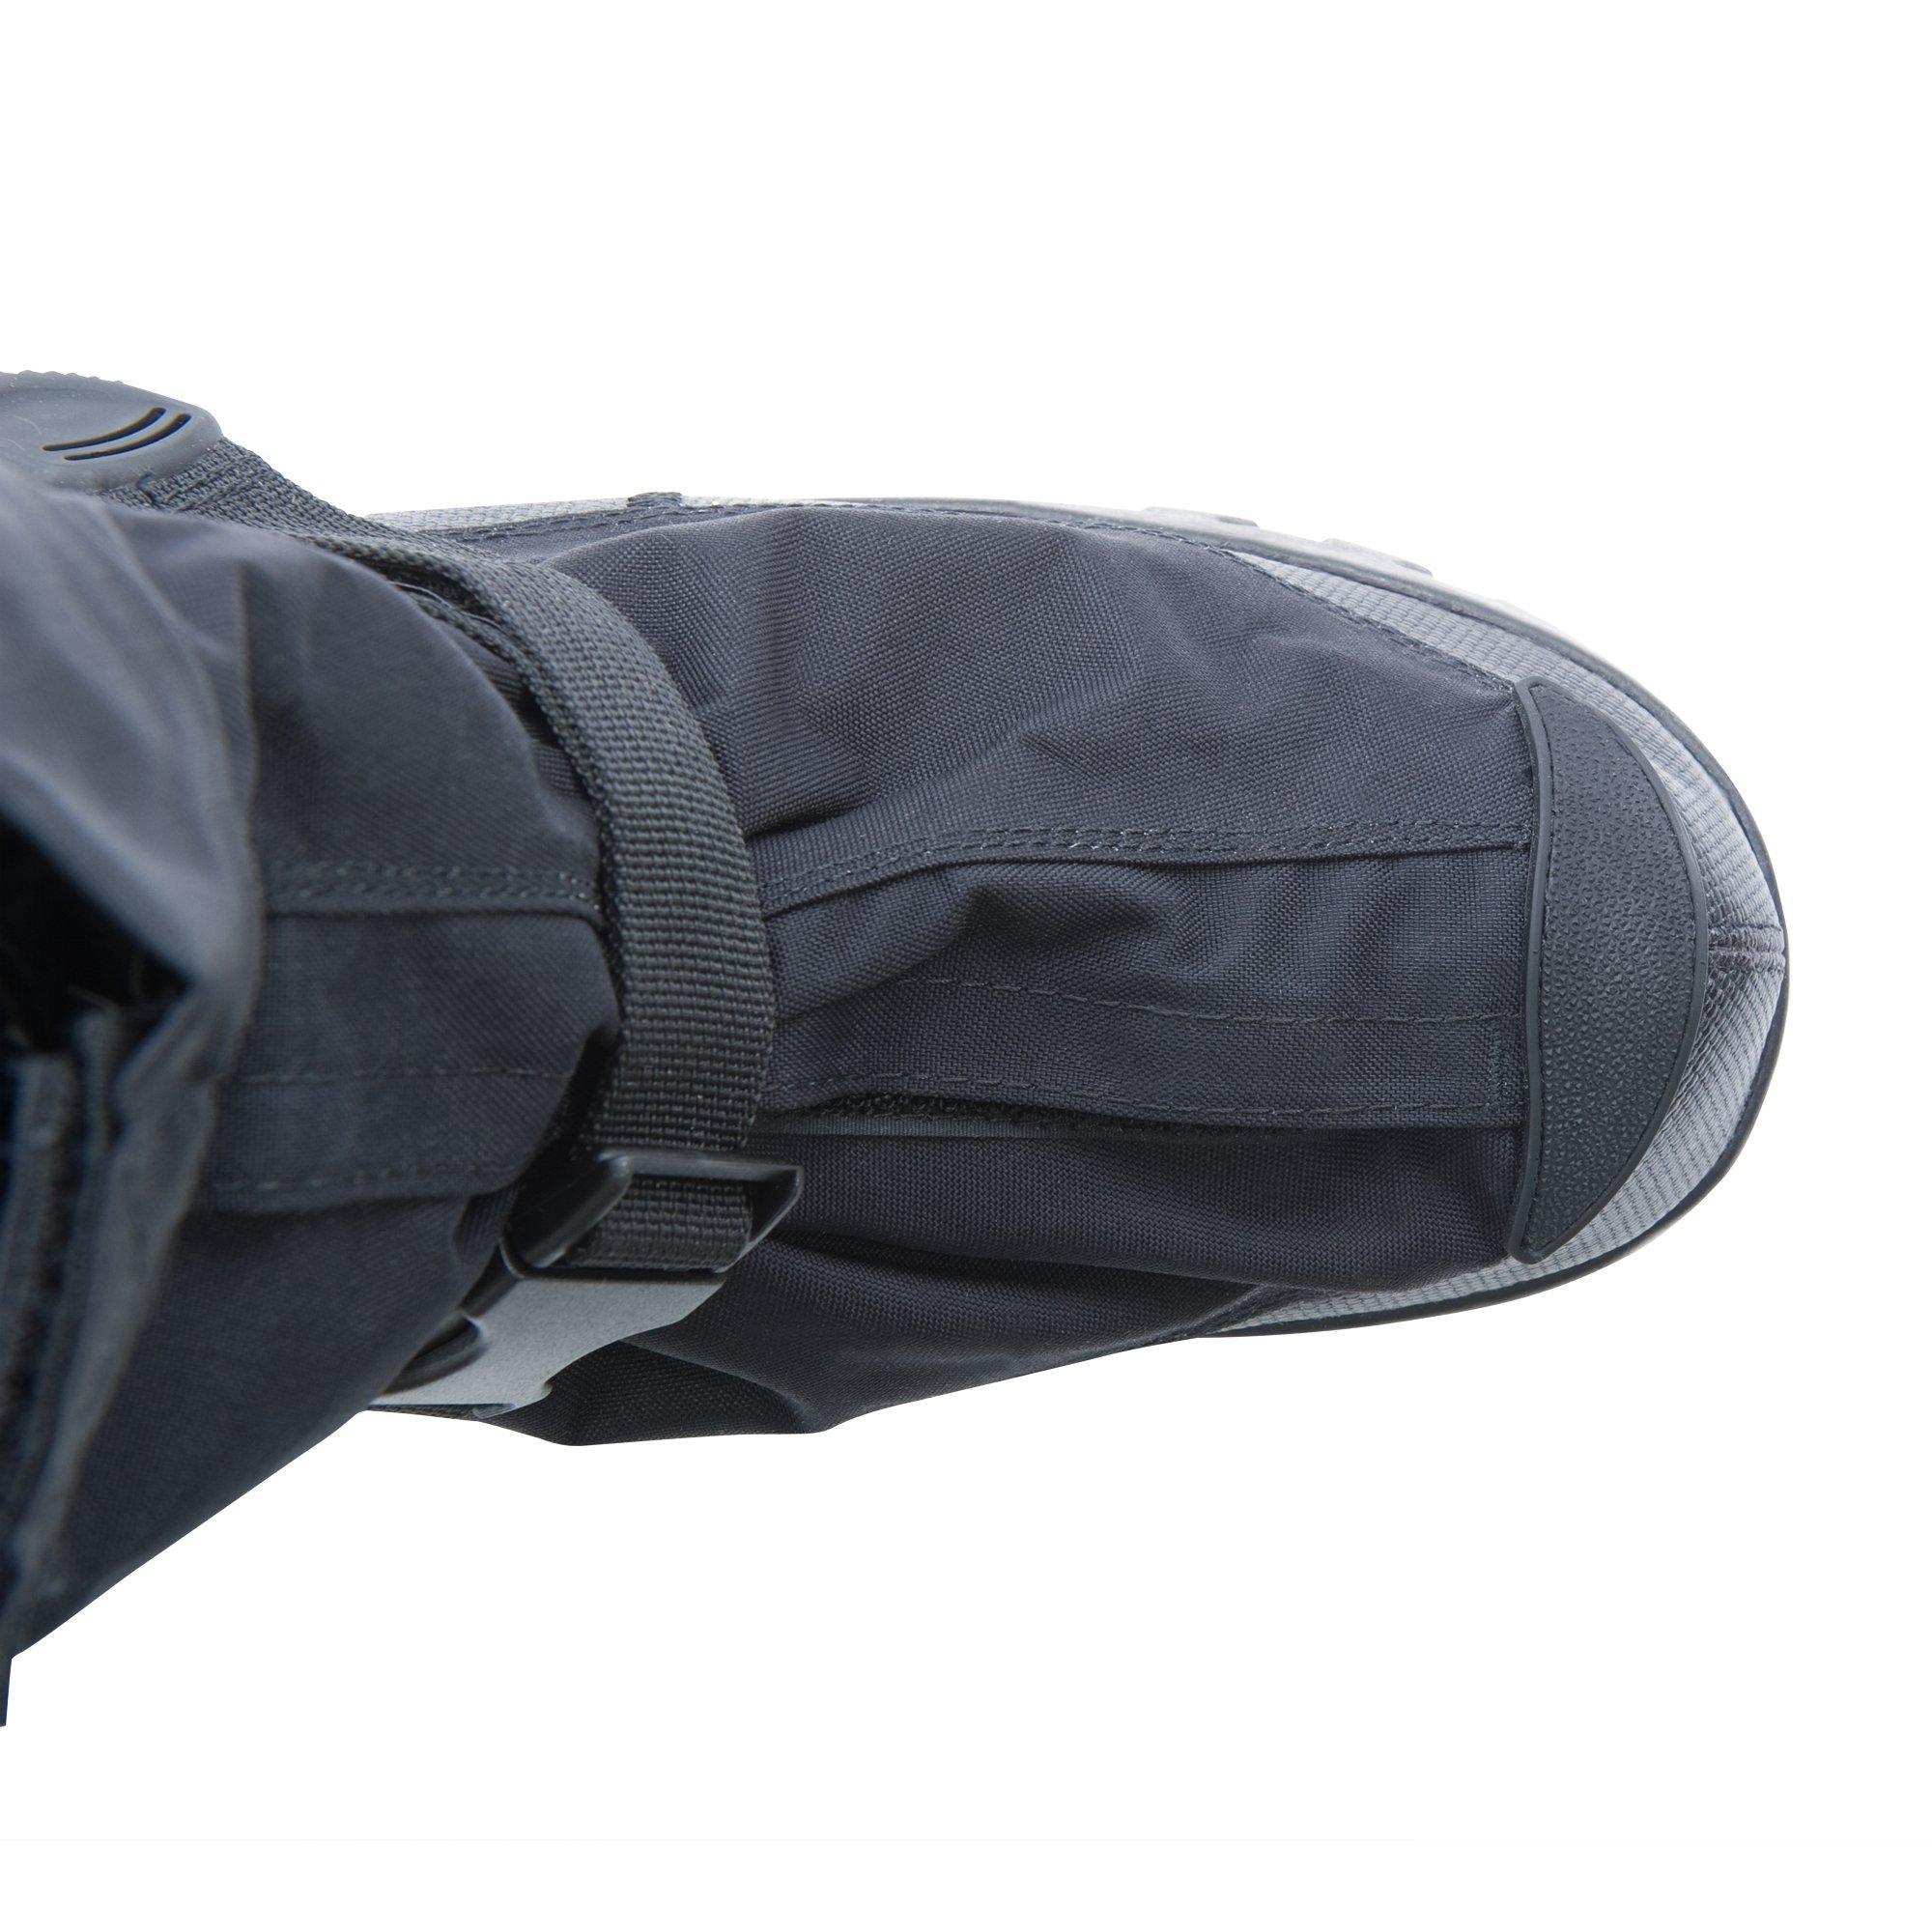 NEOS 10'' Voyager Nylon All Season Waterproof Overshoes (VNN1) by NEOS Overshoe (Image #5)